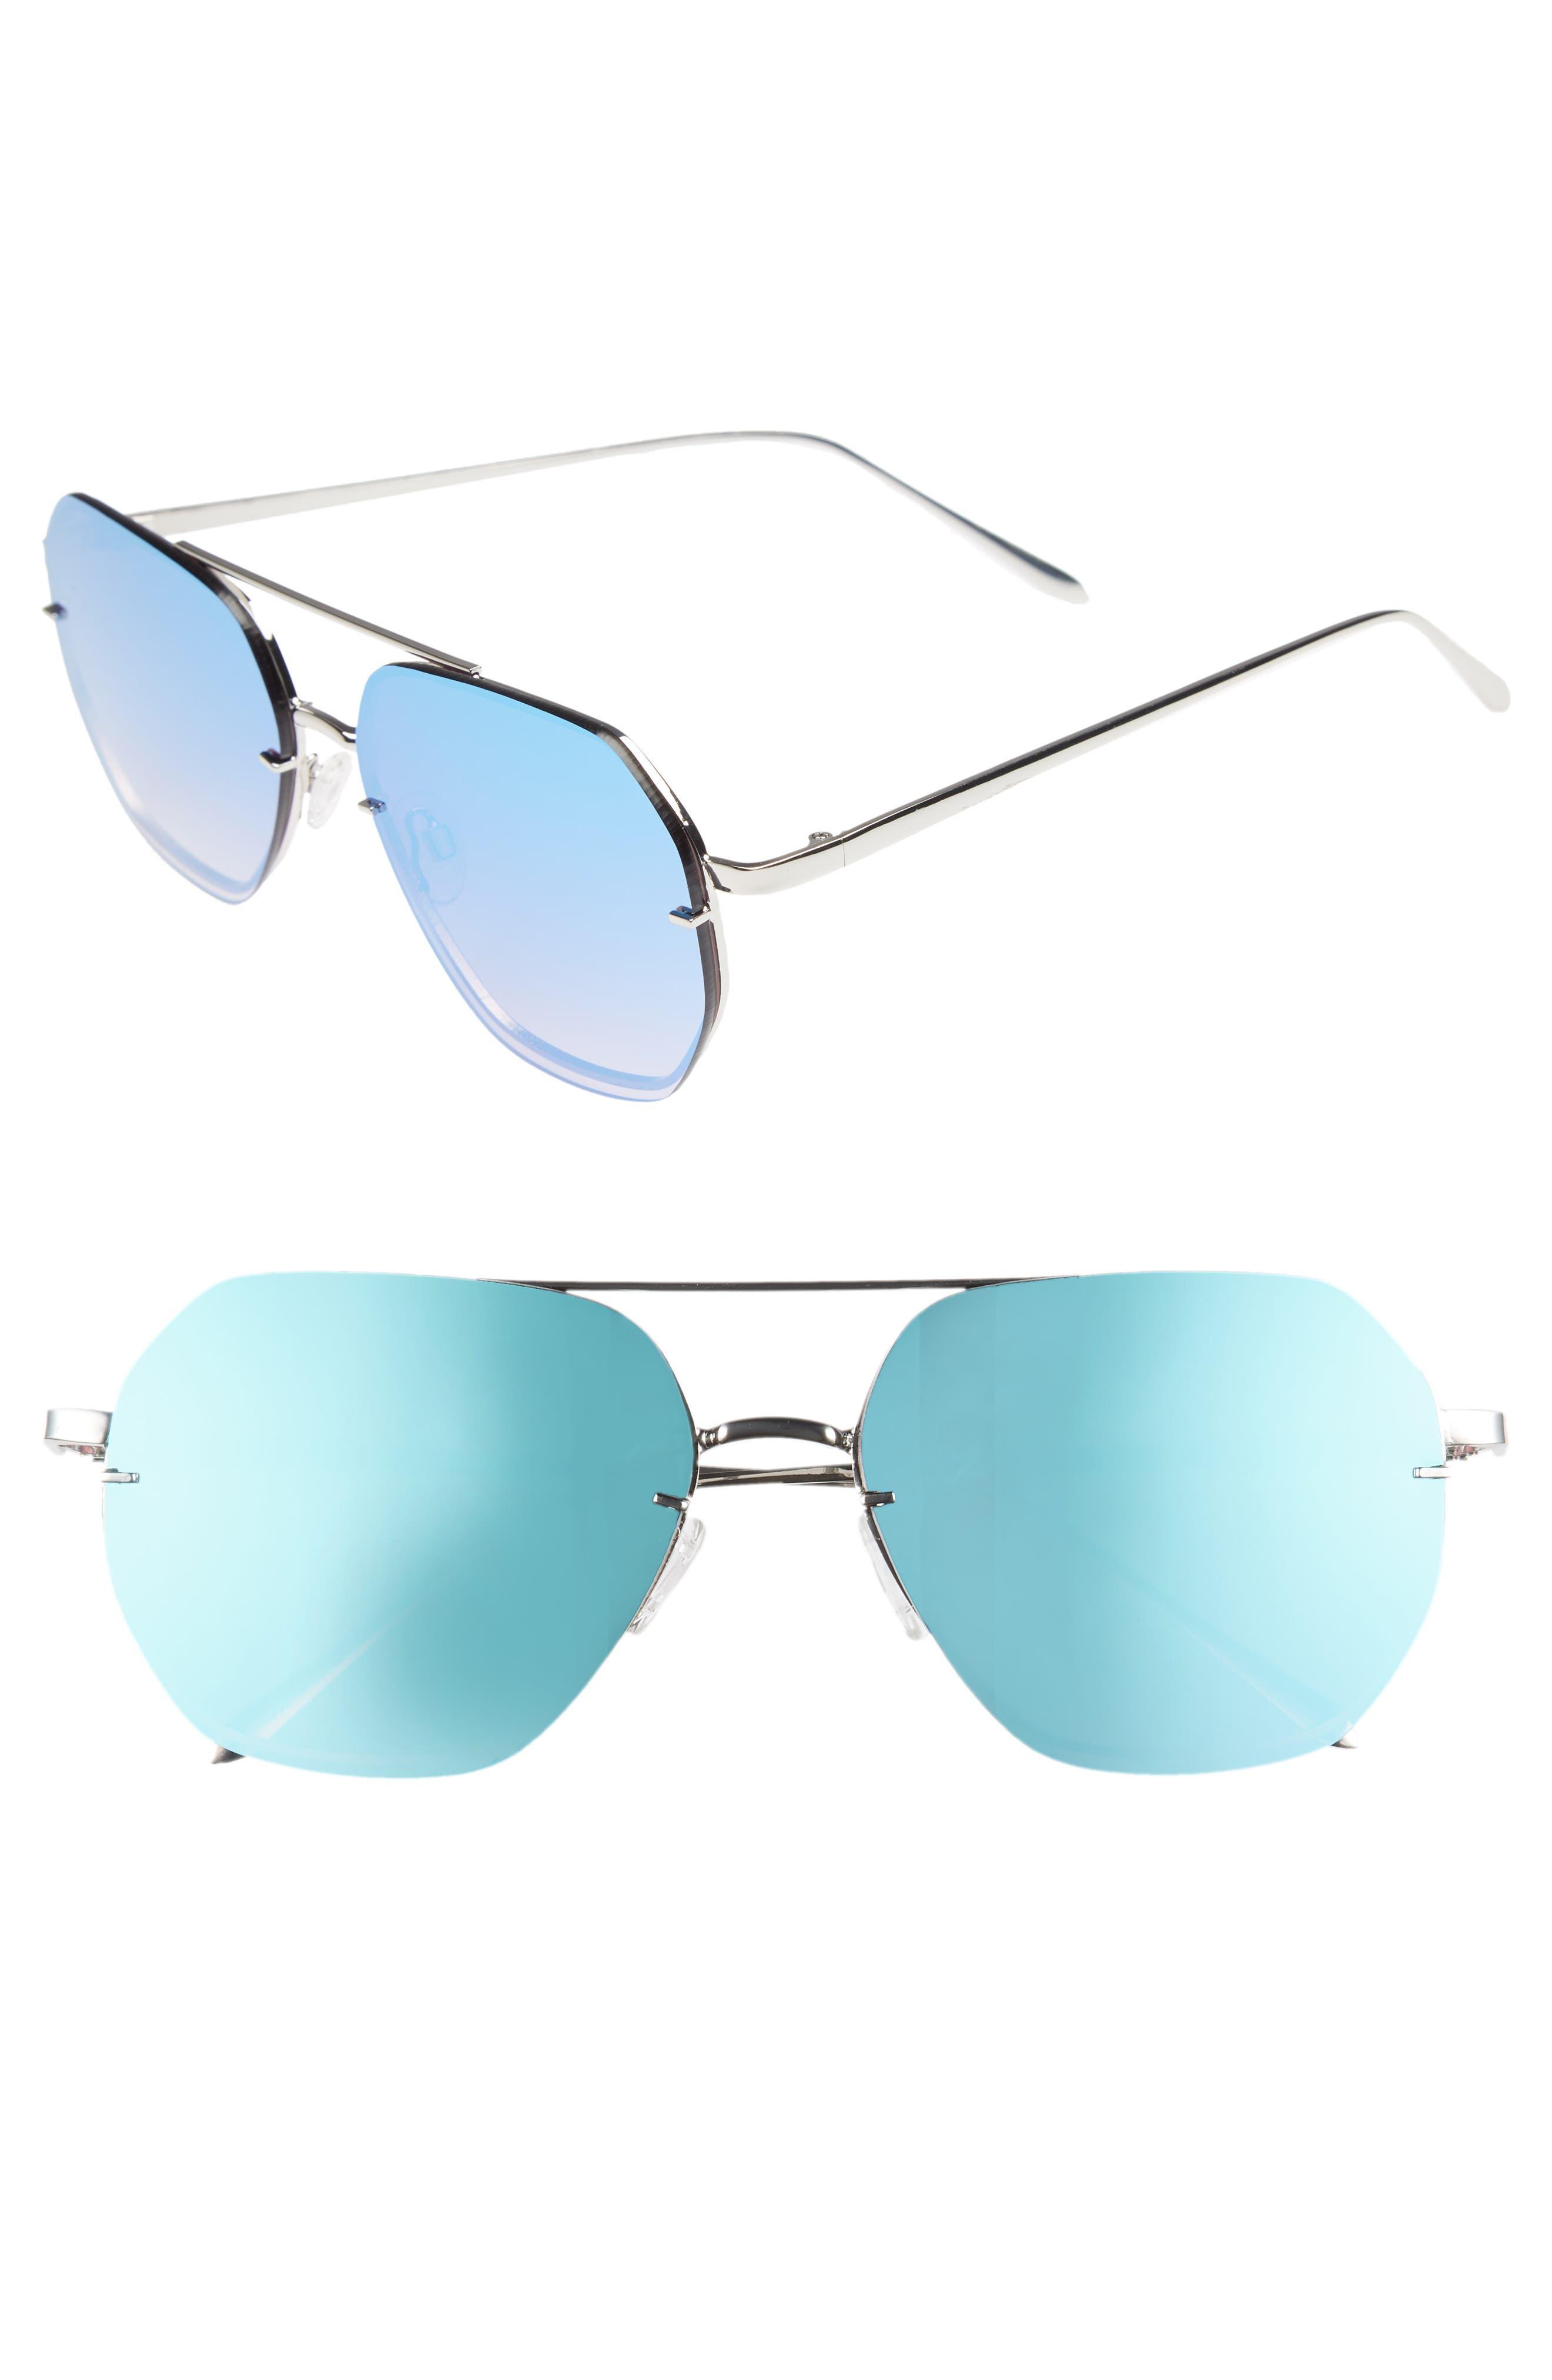 62mm Metal Flat Geo Aviator Sunglasses,                             Main thumbnail 1, color,                             Silver/ Blue